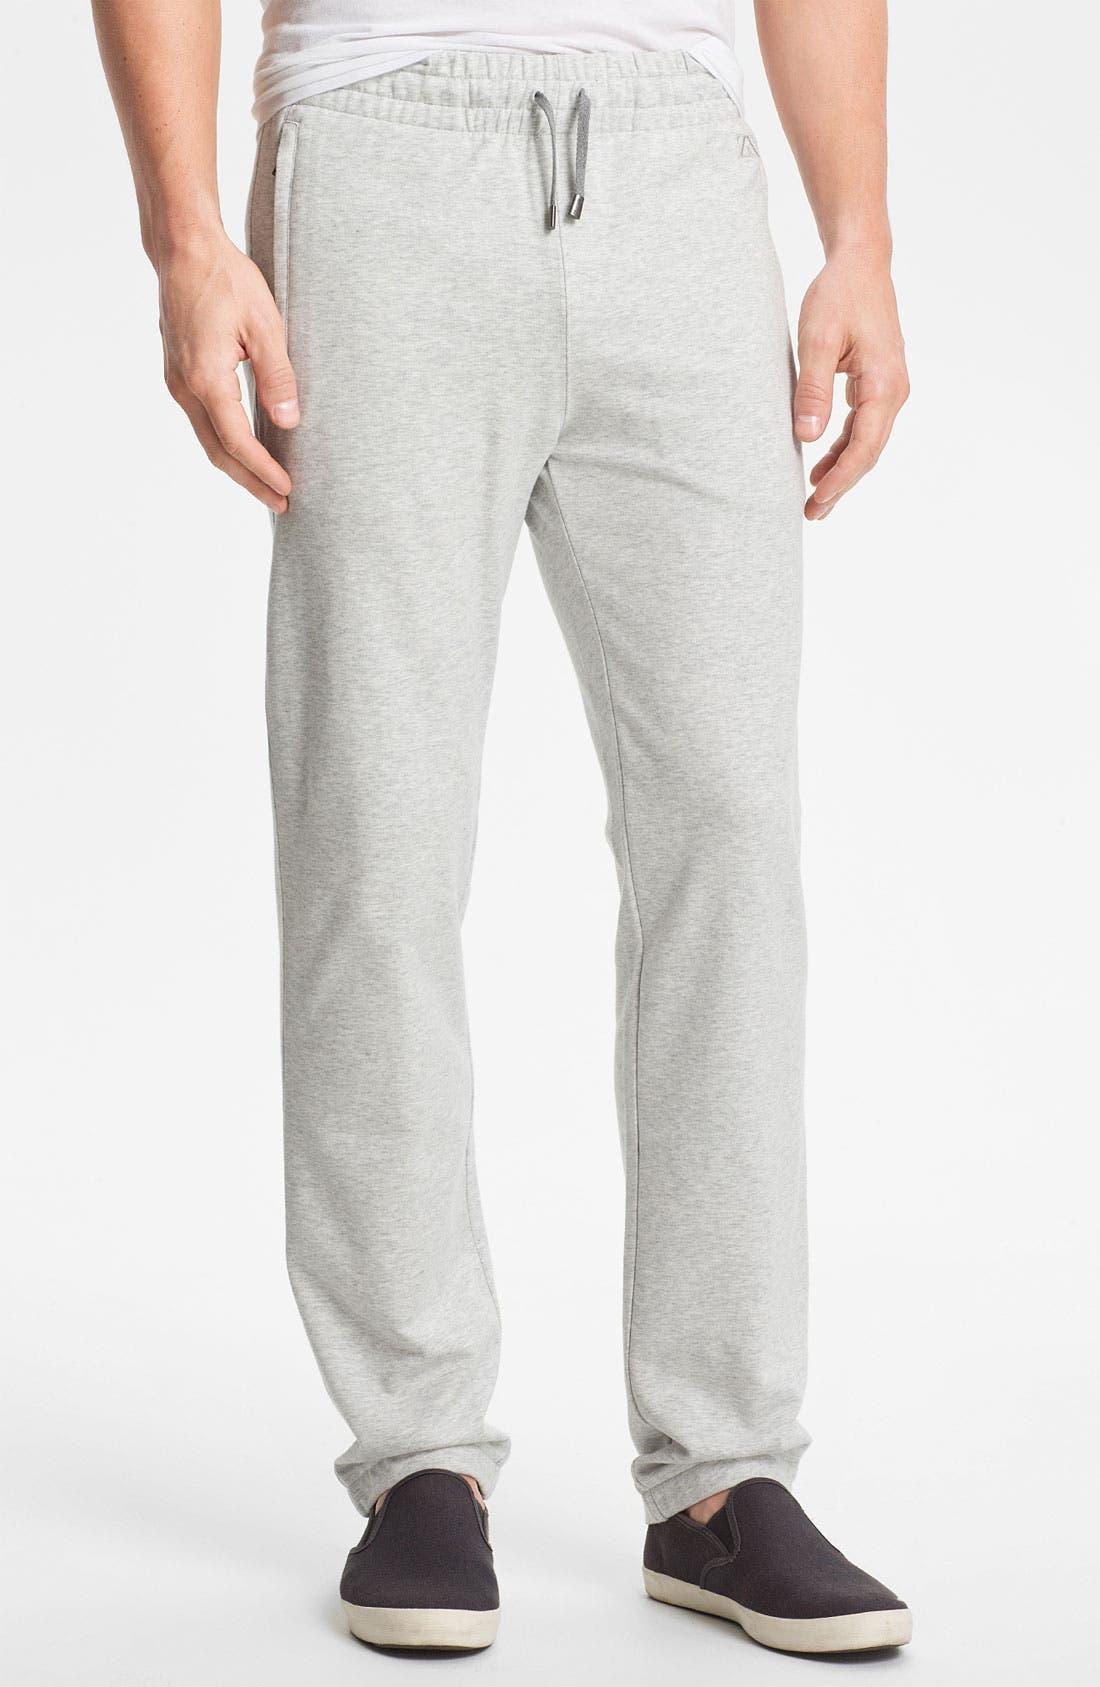 Alternate Image 1 Selected - Zegna Sport Cotton Blend Lounge Pants